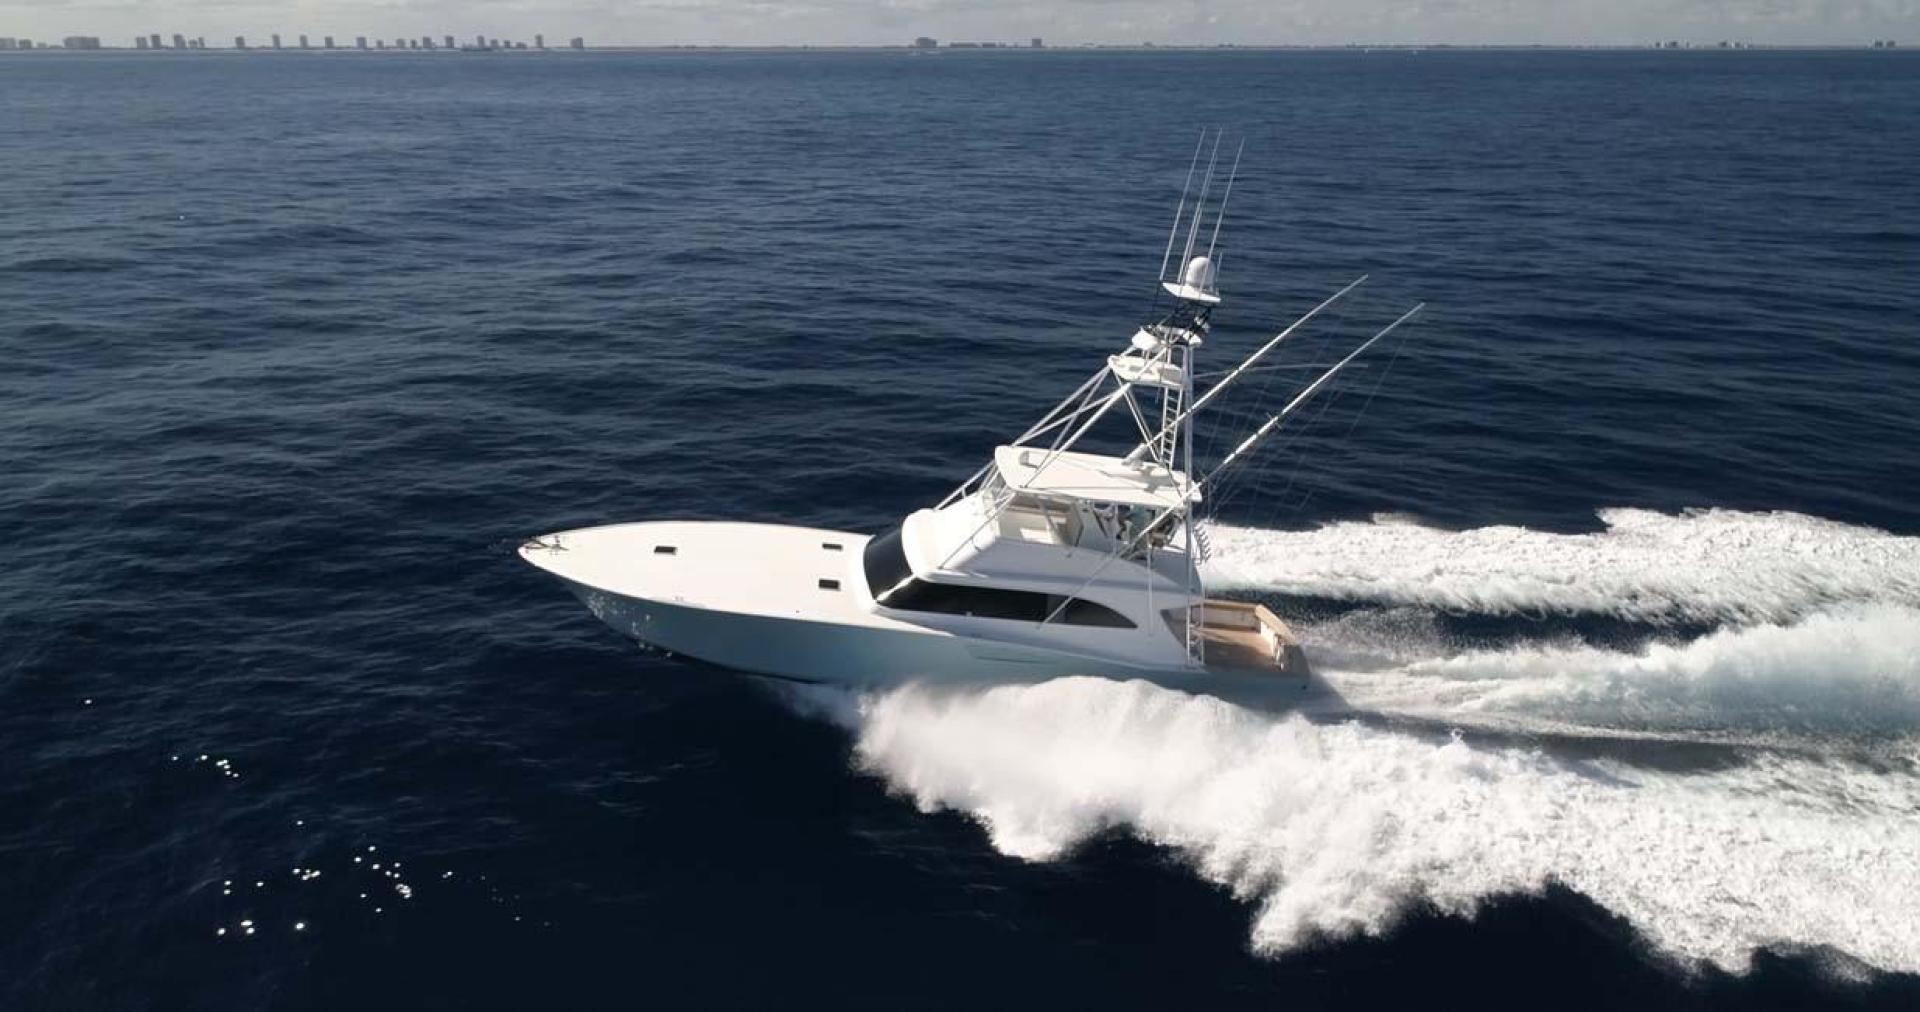 Jim-Smith-Custom-Convertible-Sportfish-2006-Silky-Palm-Beach-Florida-United-States-Port-Side-924600